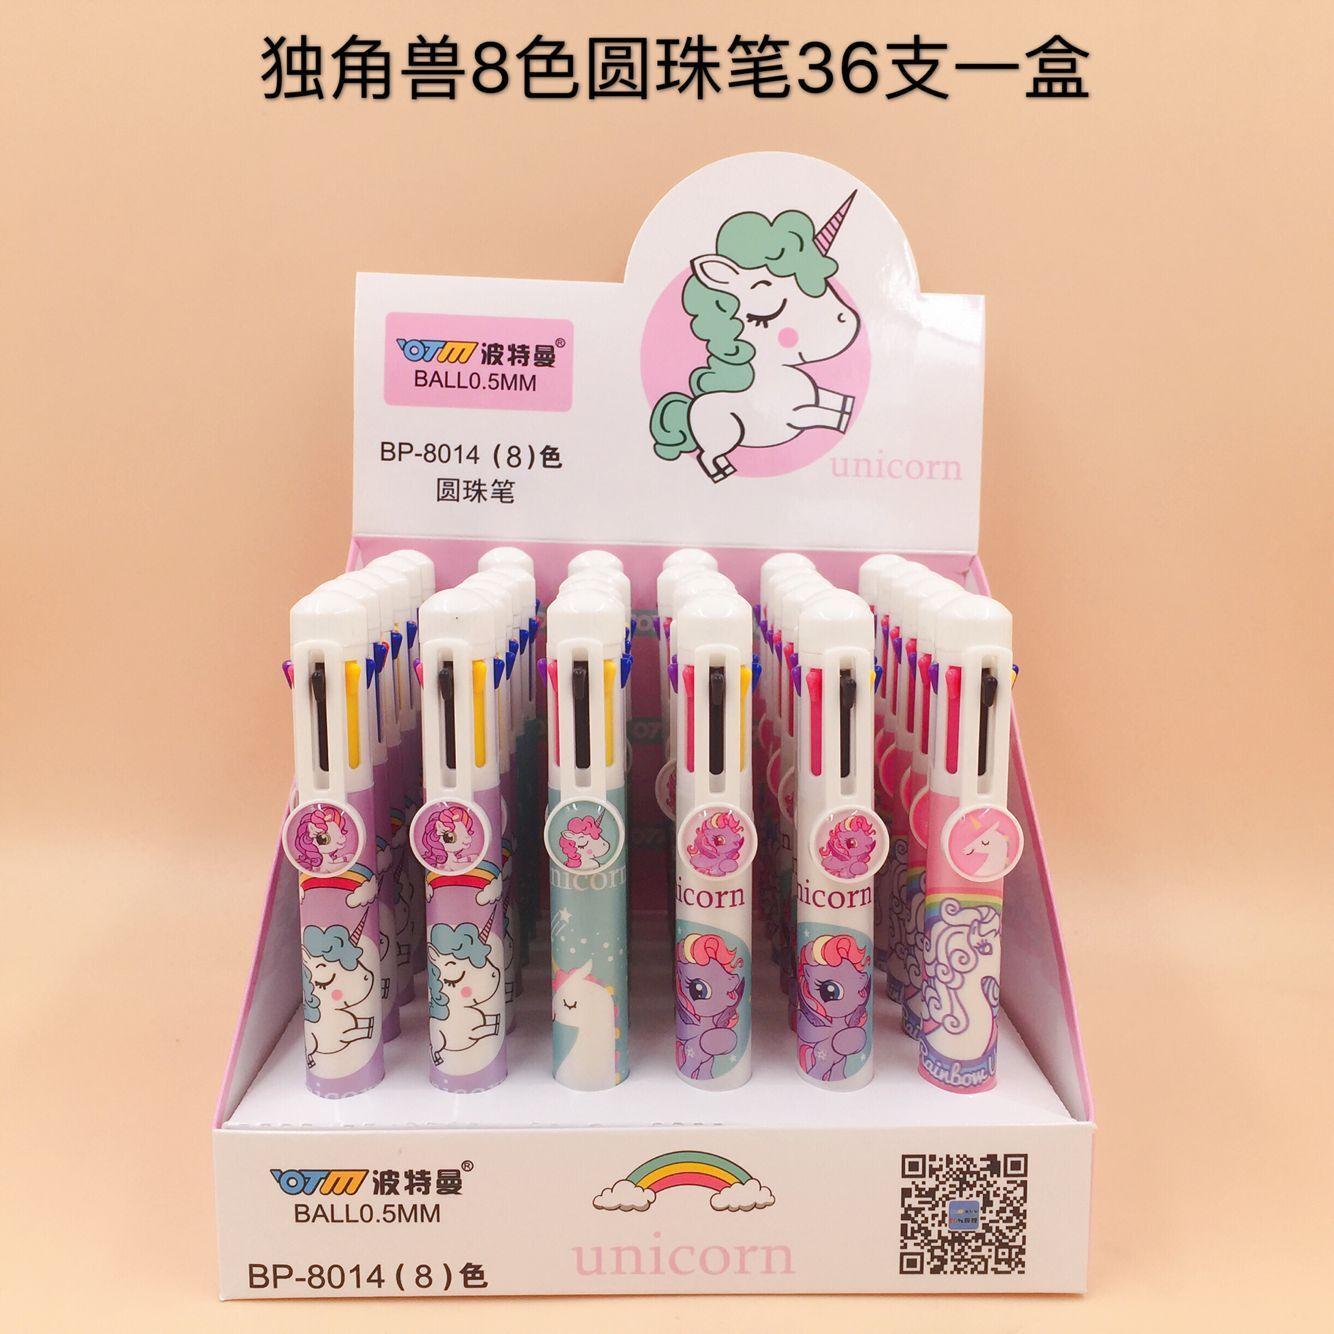 36 uds/1 mucho Kawaii bolígrafo 8 color de dibujos animados de bolígrafo plumas bolígrafos papelería escuela Oficina suministros escritura suministros